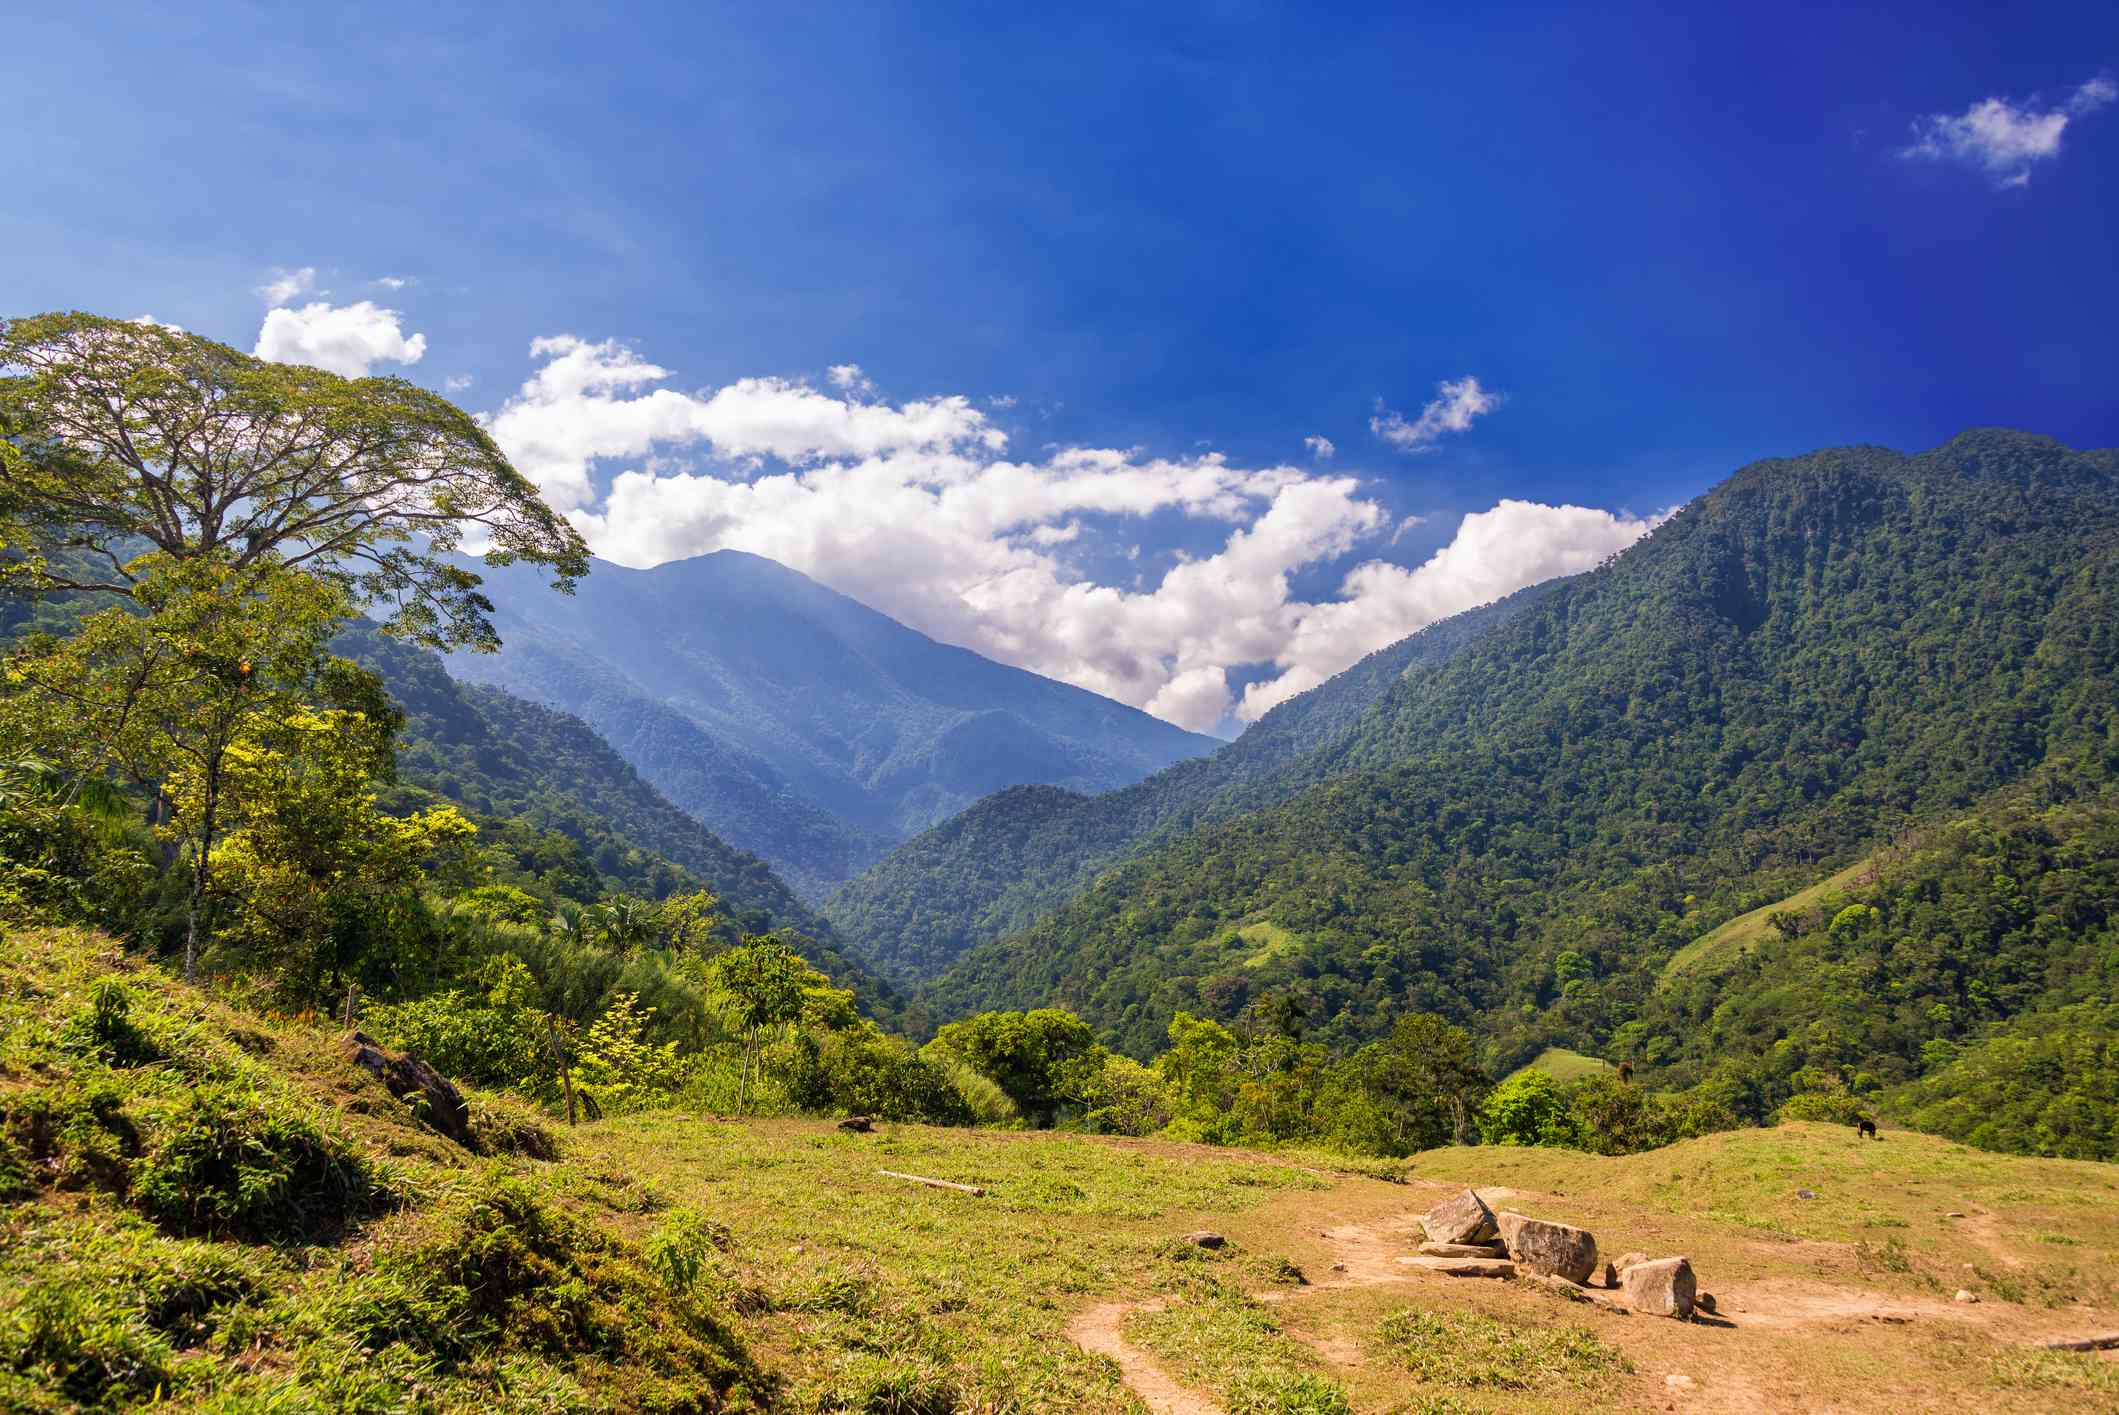 Scenic View Of Mountains Against Sky At Sierra Nevada De Santa Marta